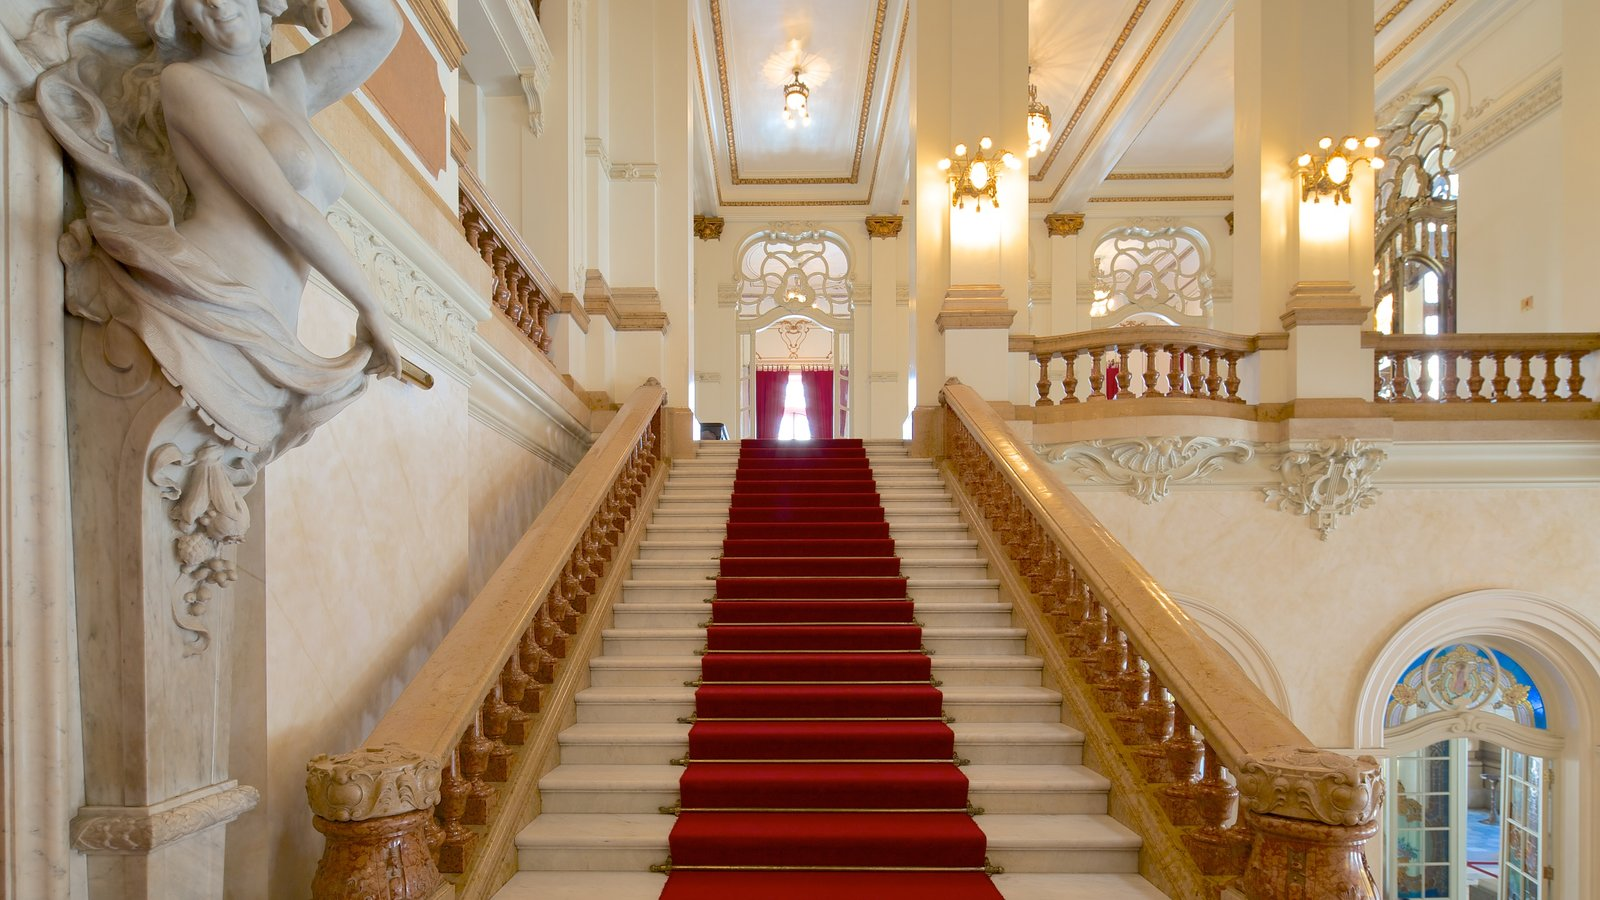 Teatro Municipal caracterizando arquitetura de patrimônio, vistas internas e cenas de teatro